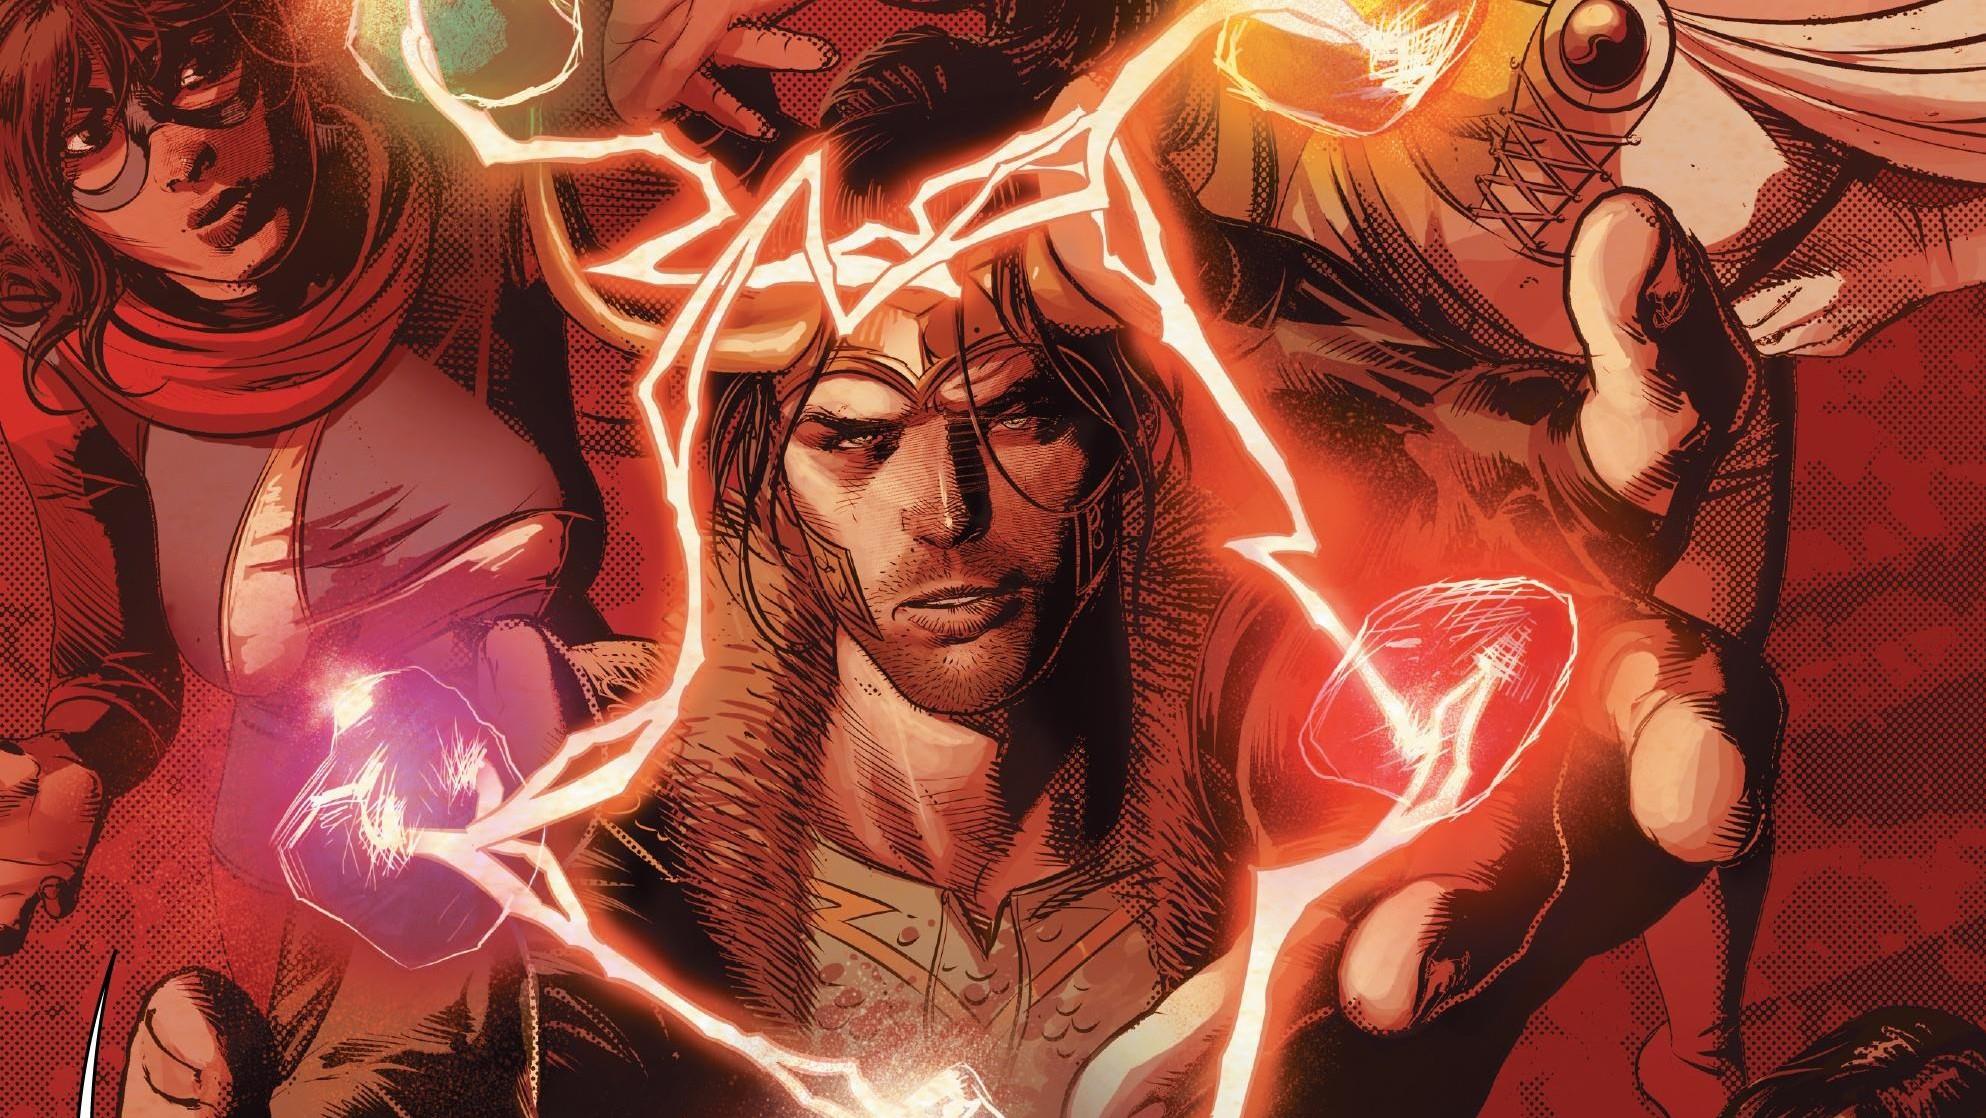 General 1986x1118 comics comic books comic art Marvel Comics Loki Ms. Marvel Infinity stones